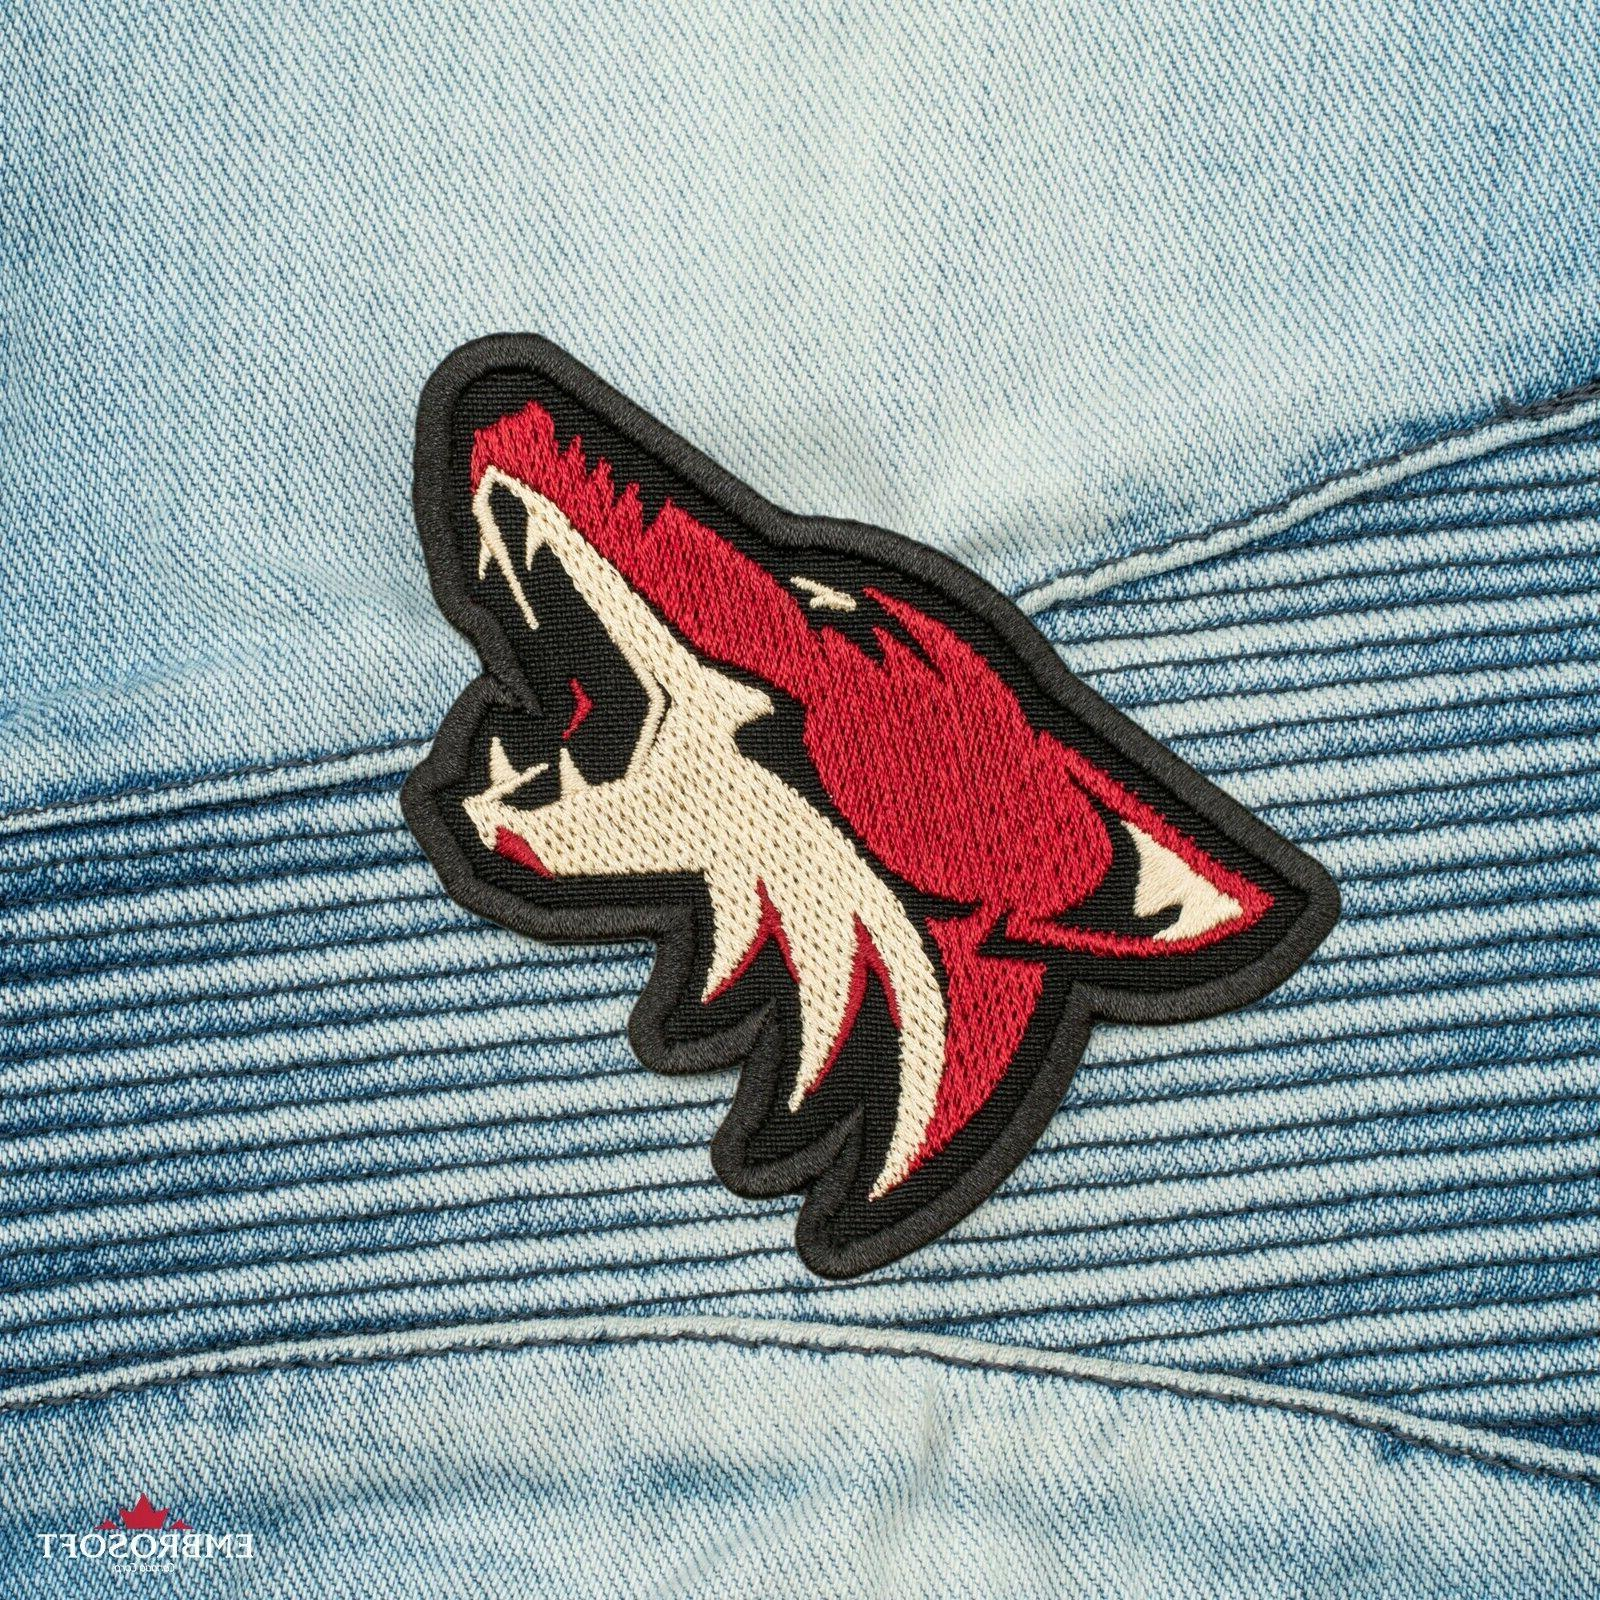 🏒Arizona Sports Team Emblem, Embroidered